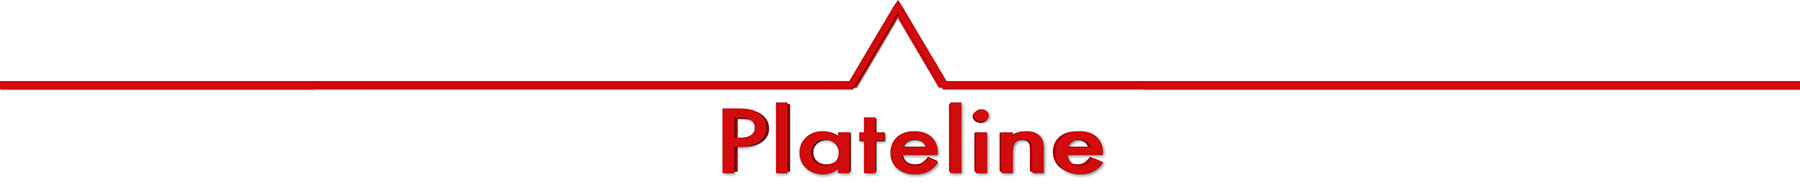 plateline-logo-5